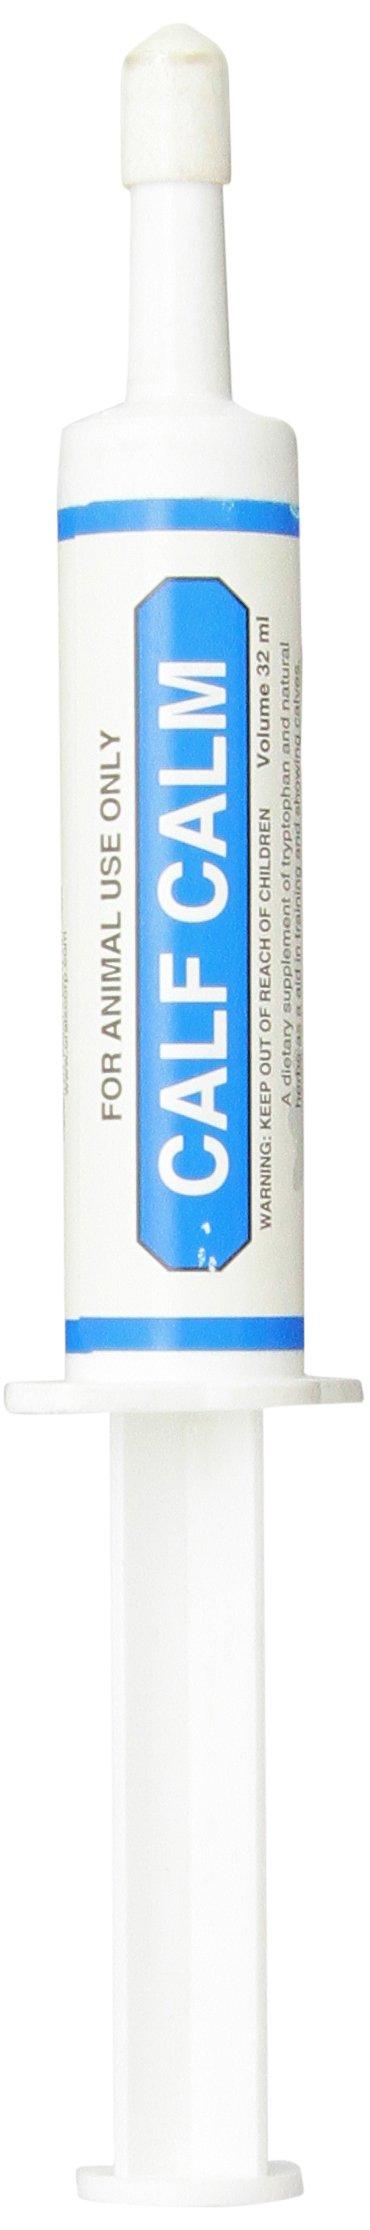 Oralx Corporation Calf Calm Paste for Horses by Oralx Corporation